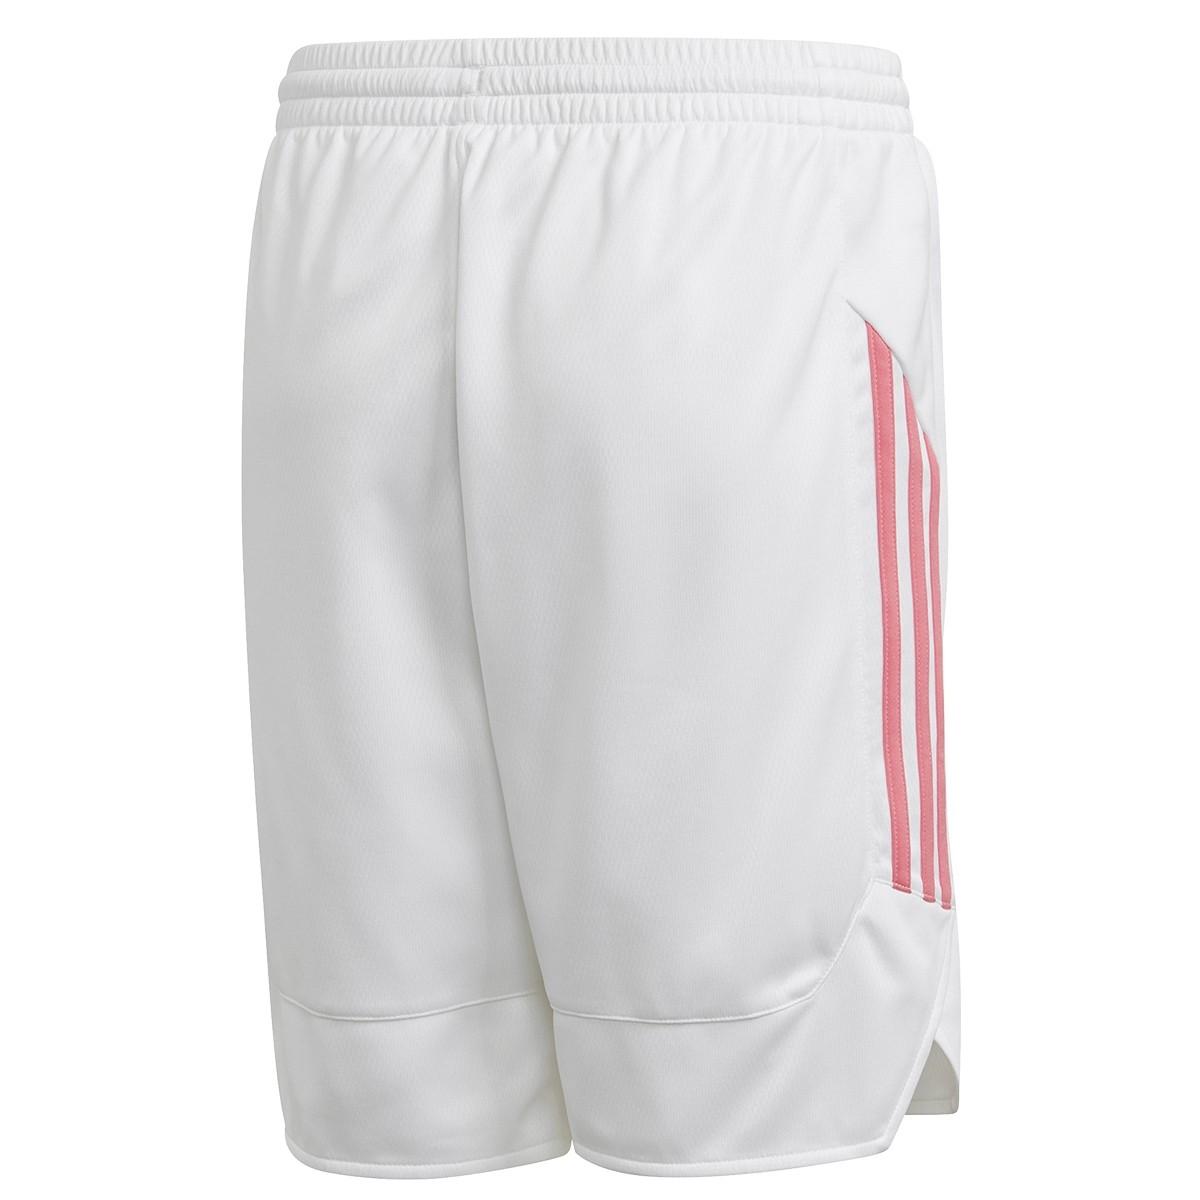 ADIDAS Real Madrid Junior Short 20/21 'Home'-GI4605